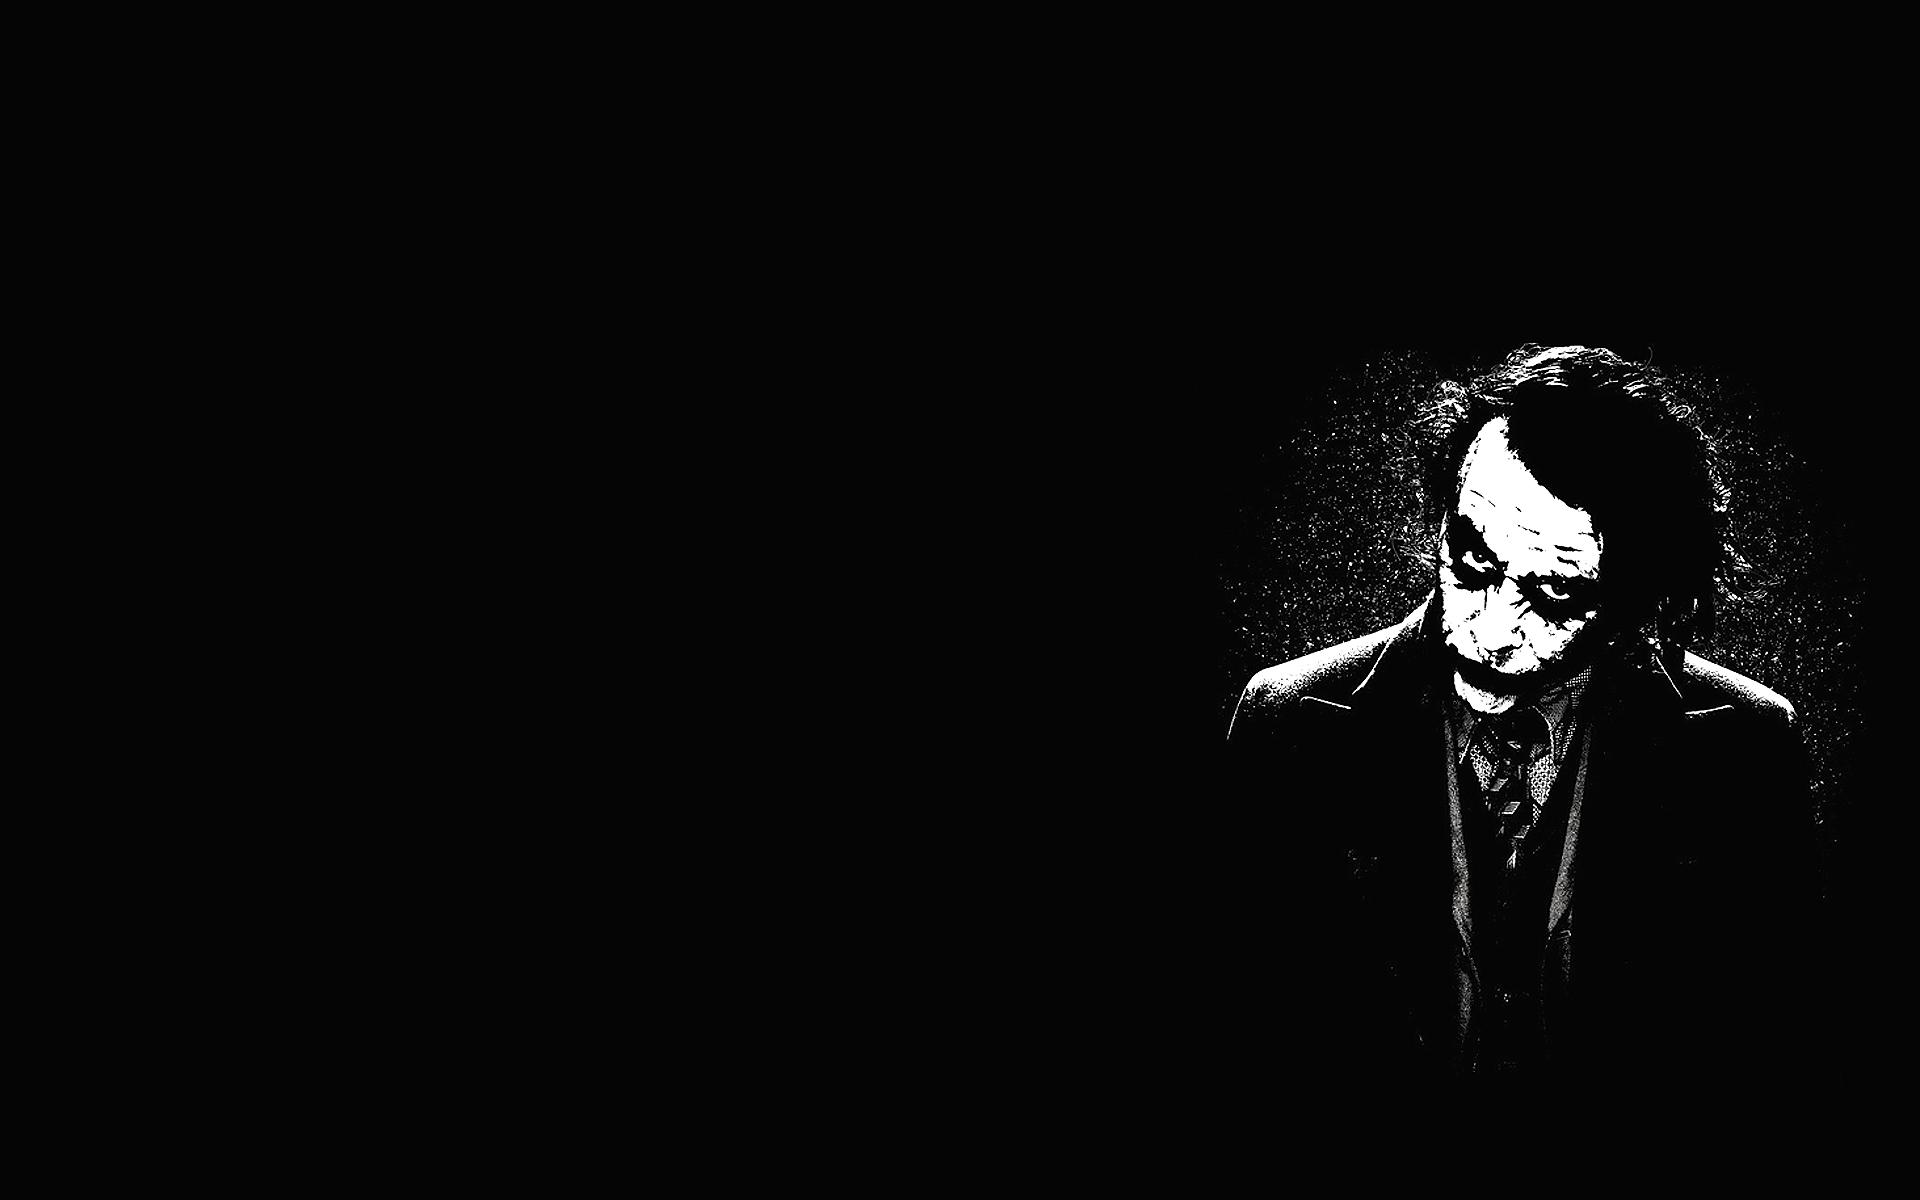 the joker desktop backgrounds - wallpaper cave